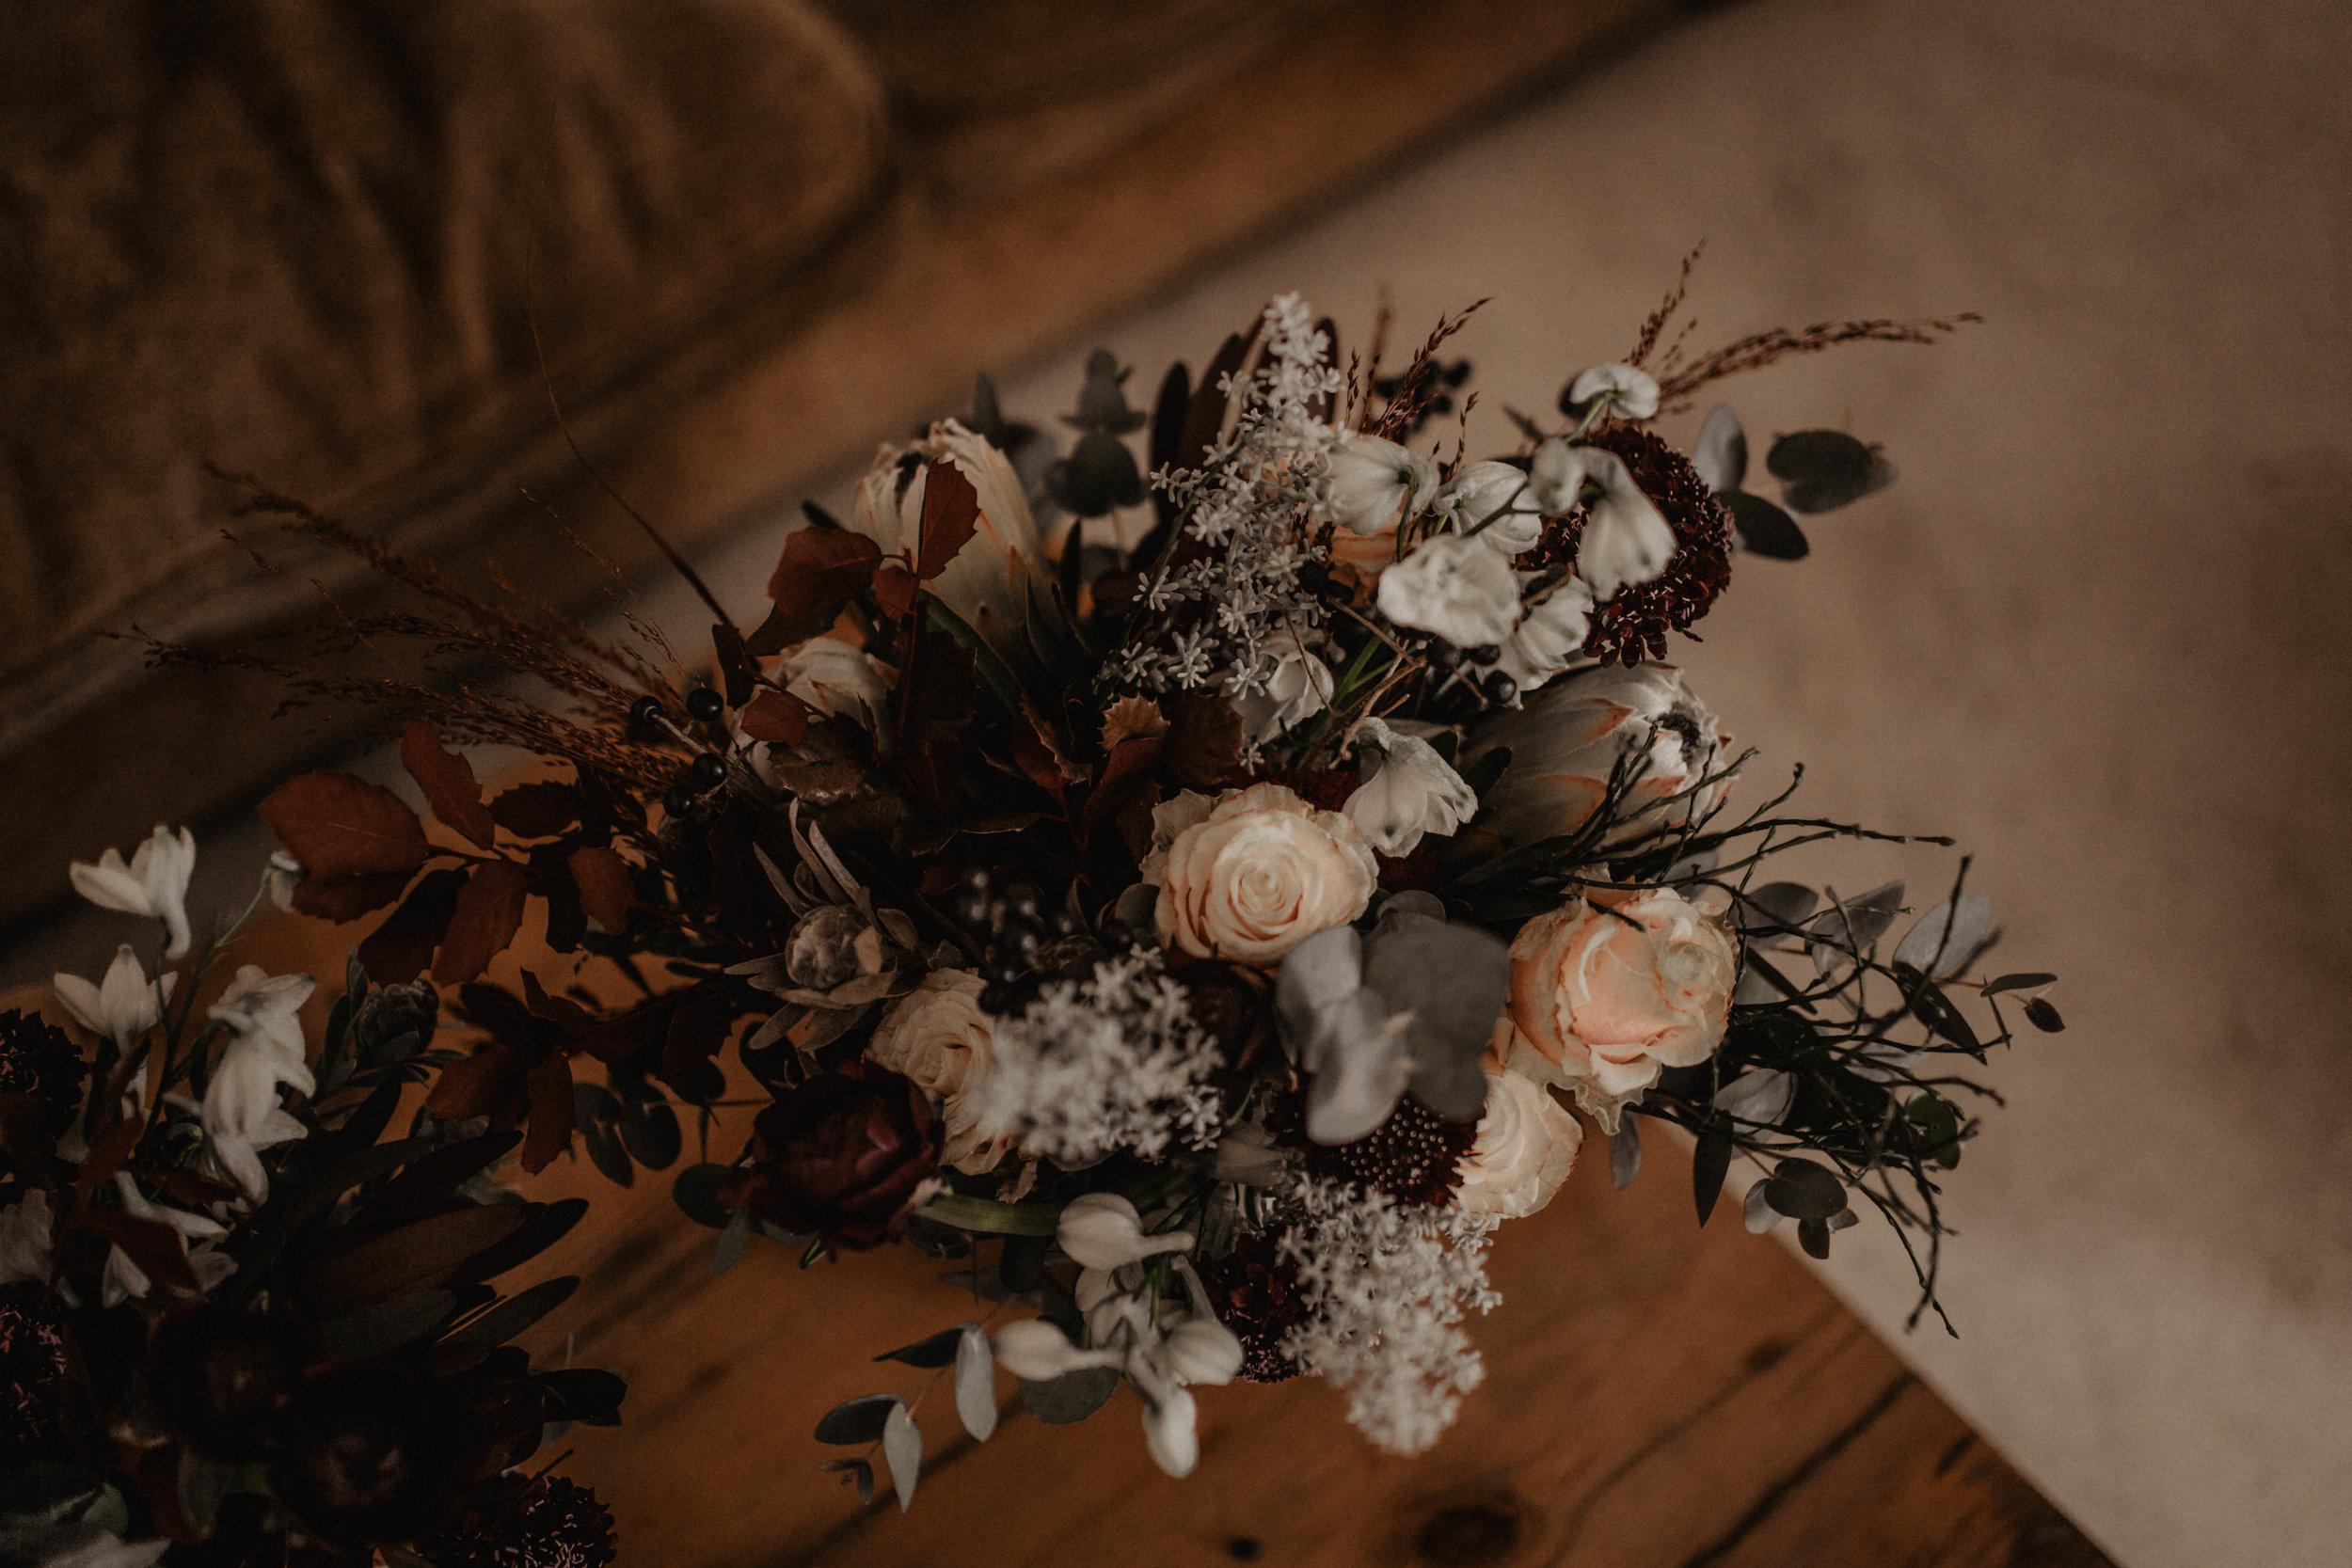 thenortherngirlphotography-photography-weddingphotography-couple-bodasconestilo-bodasenbarcelona-martadavid-72.jpg